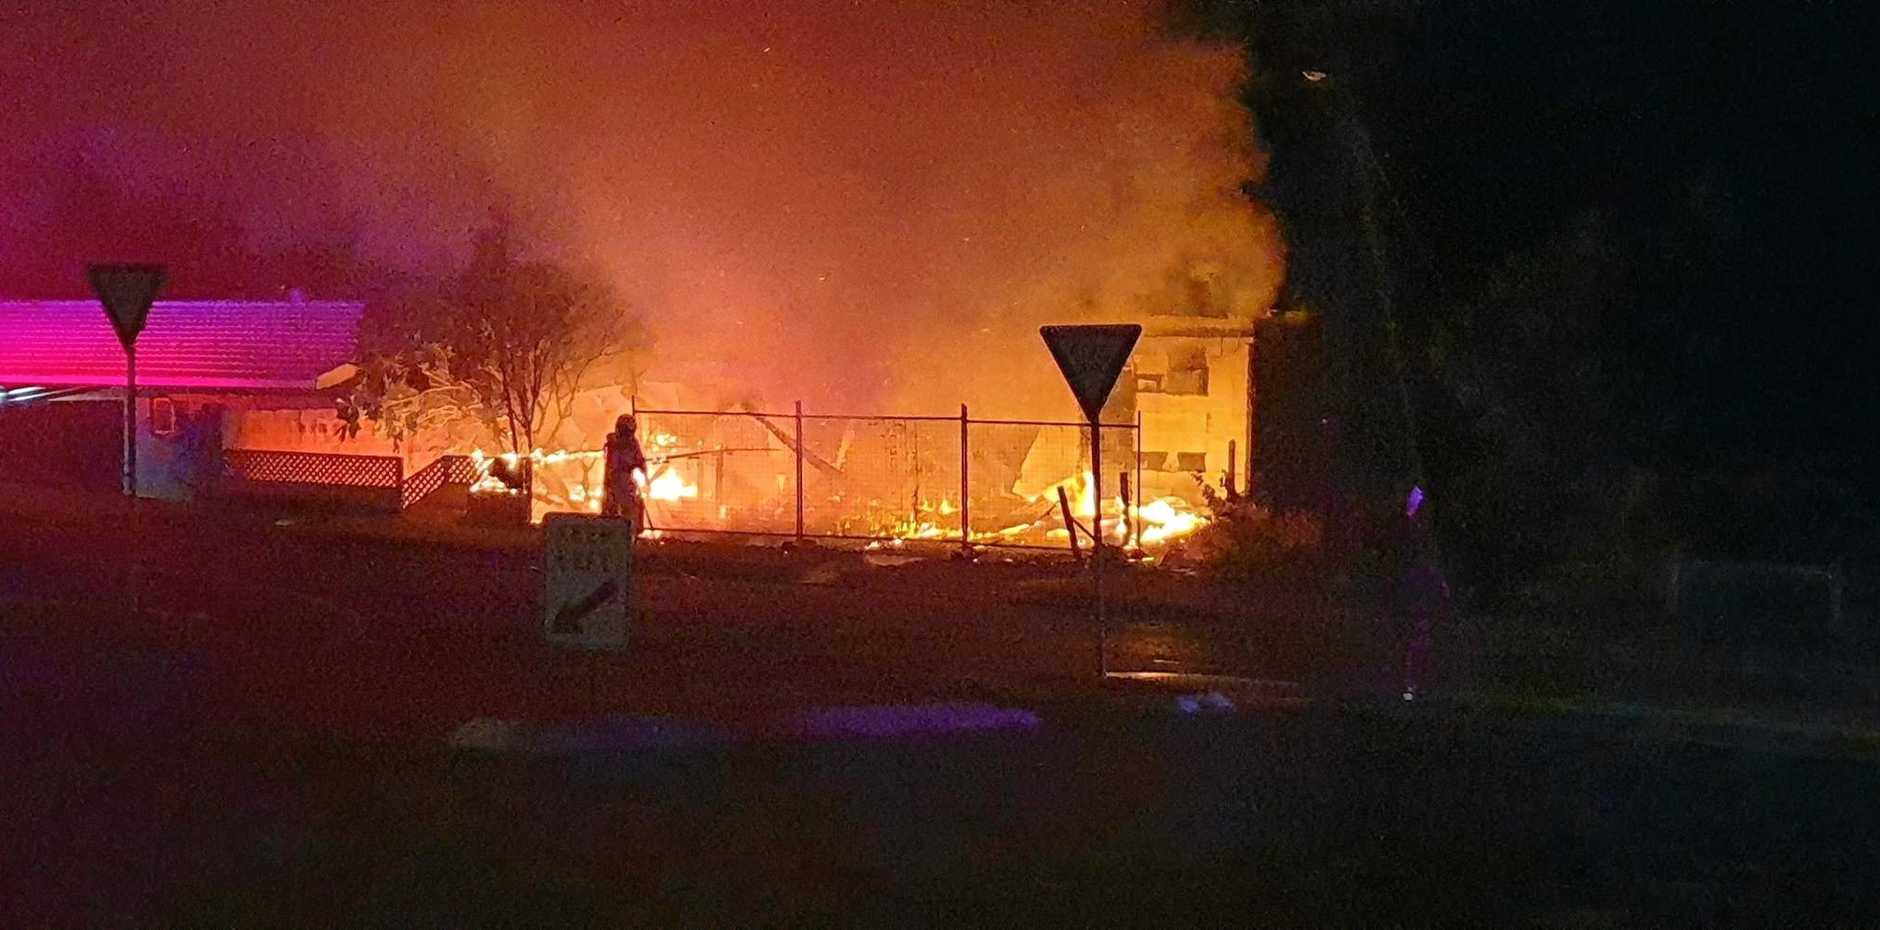 Shannon McKellar-McLoughlin took these photos of a house fire at East Ballina.